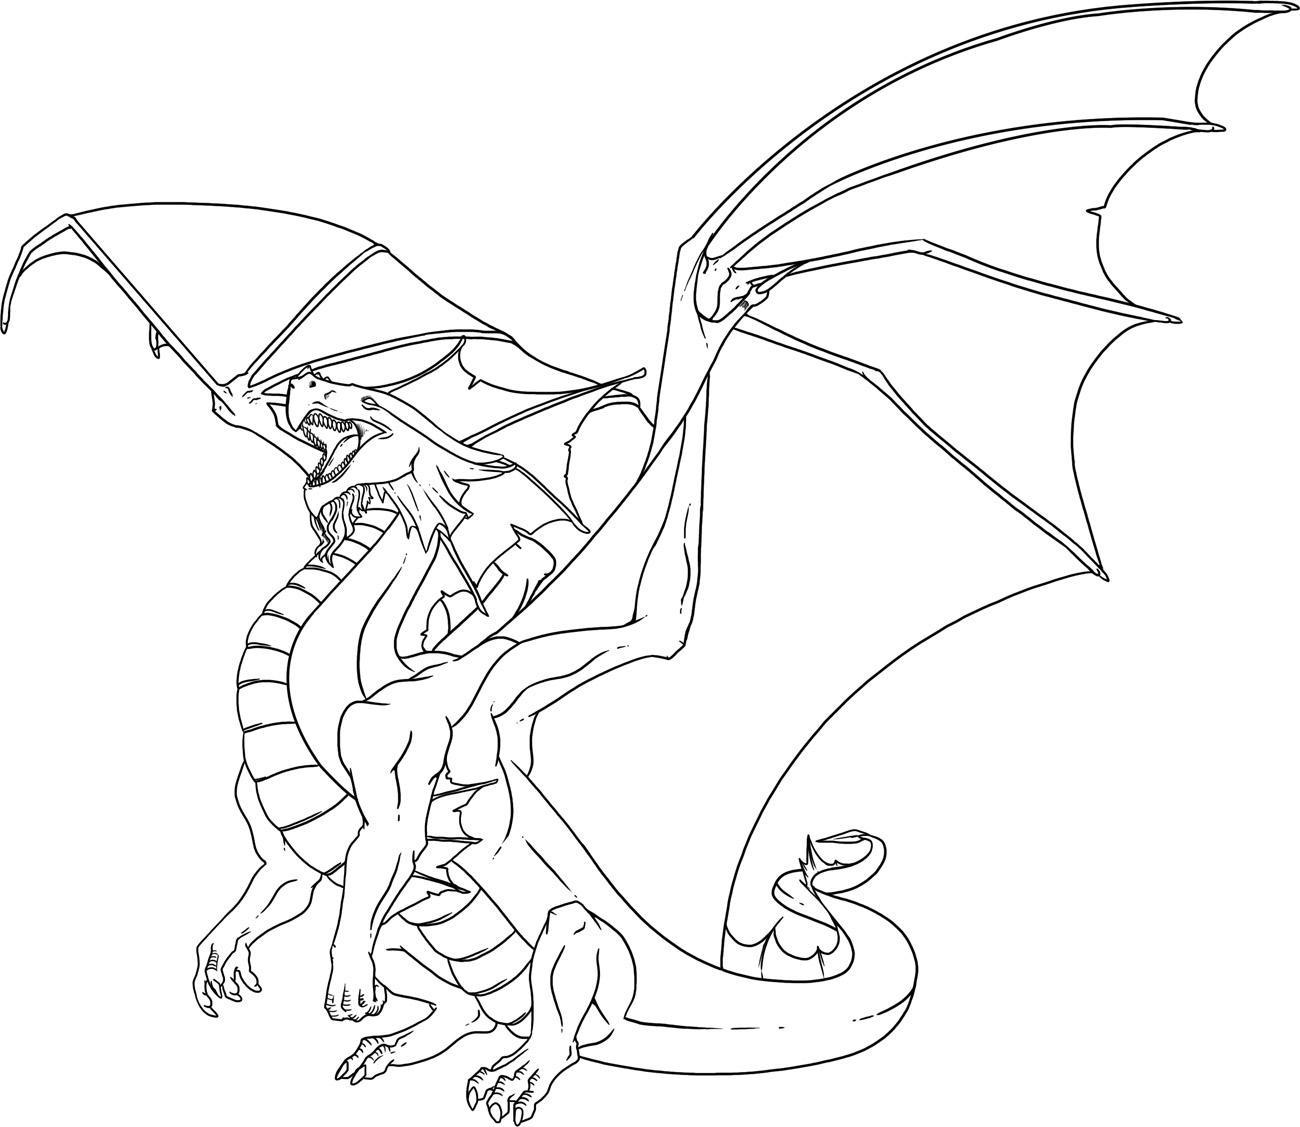 Draon coloring #3, Download drawings